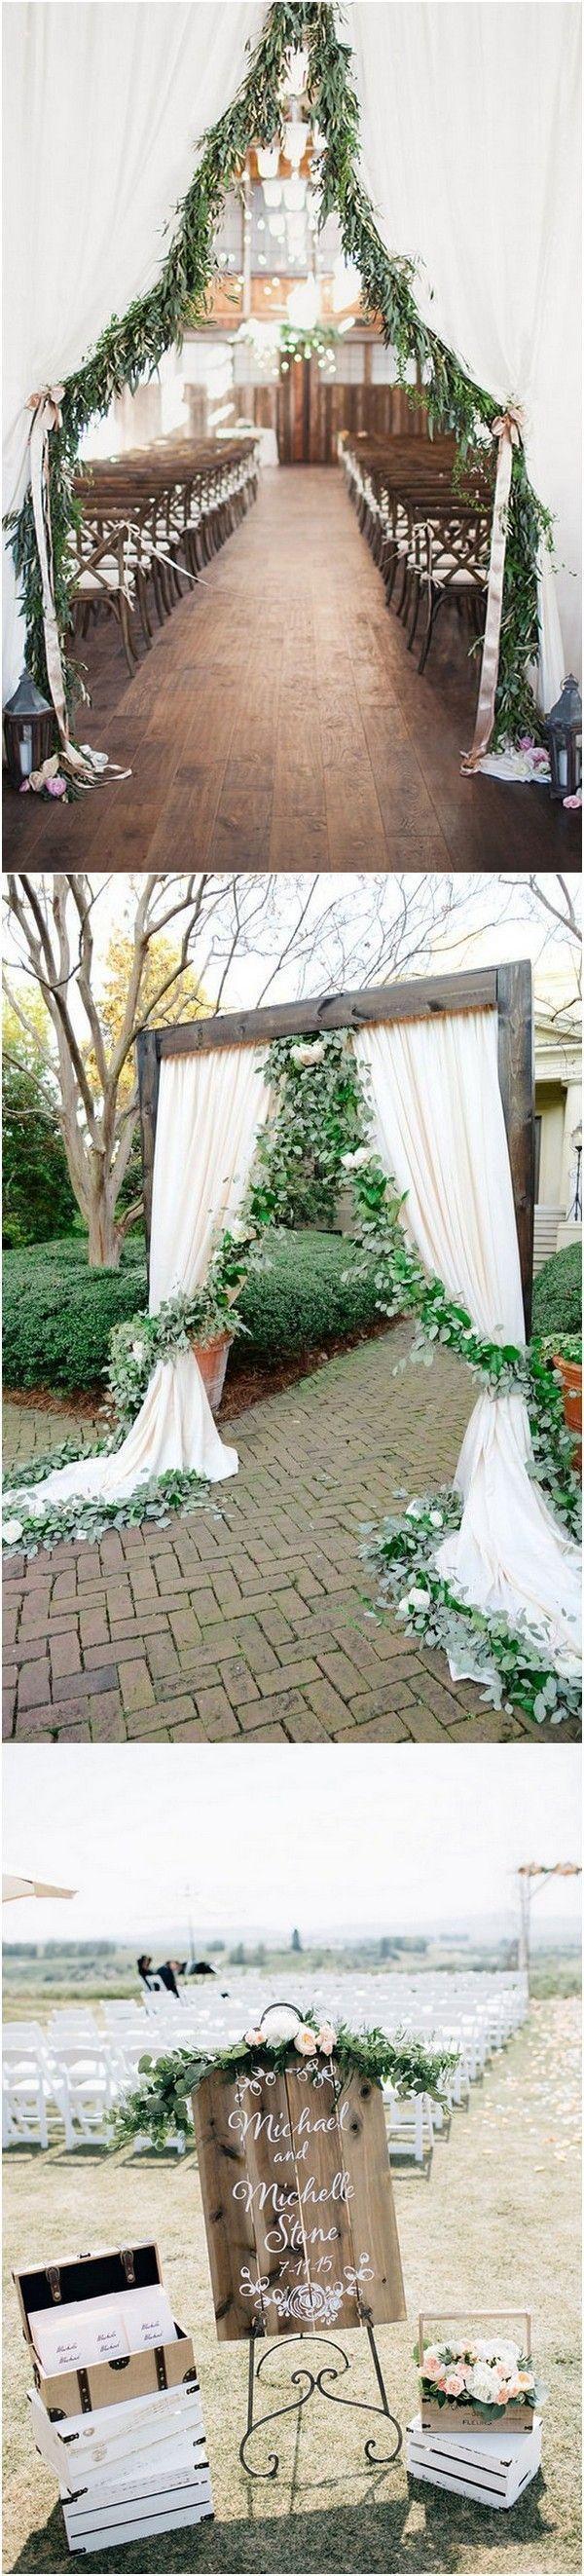 chic greenery wedding ceremony decoration ideas 332